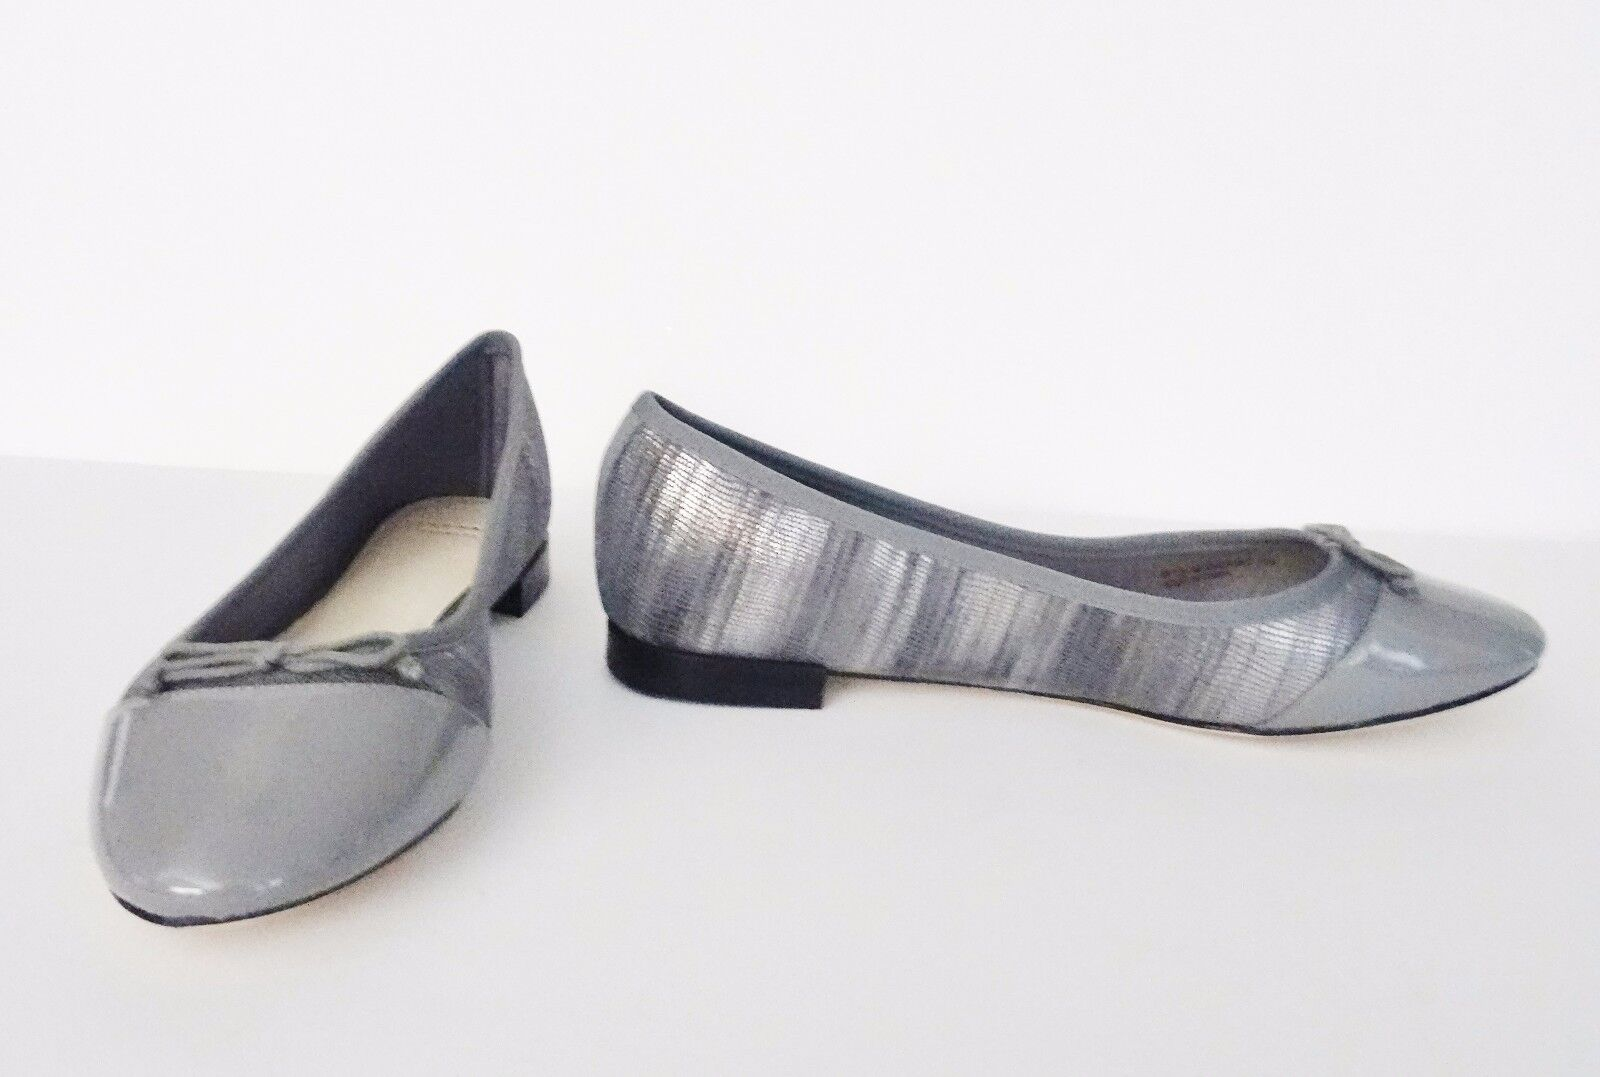 NIb Cole Haan Sarina Snake Embossed Leder Ballet Flat Ironstone Schuhes Sz 8.5 M Ironstone Flat d1463b